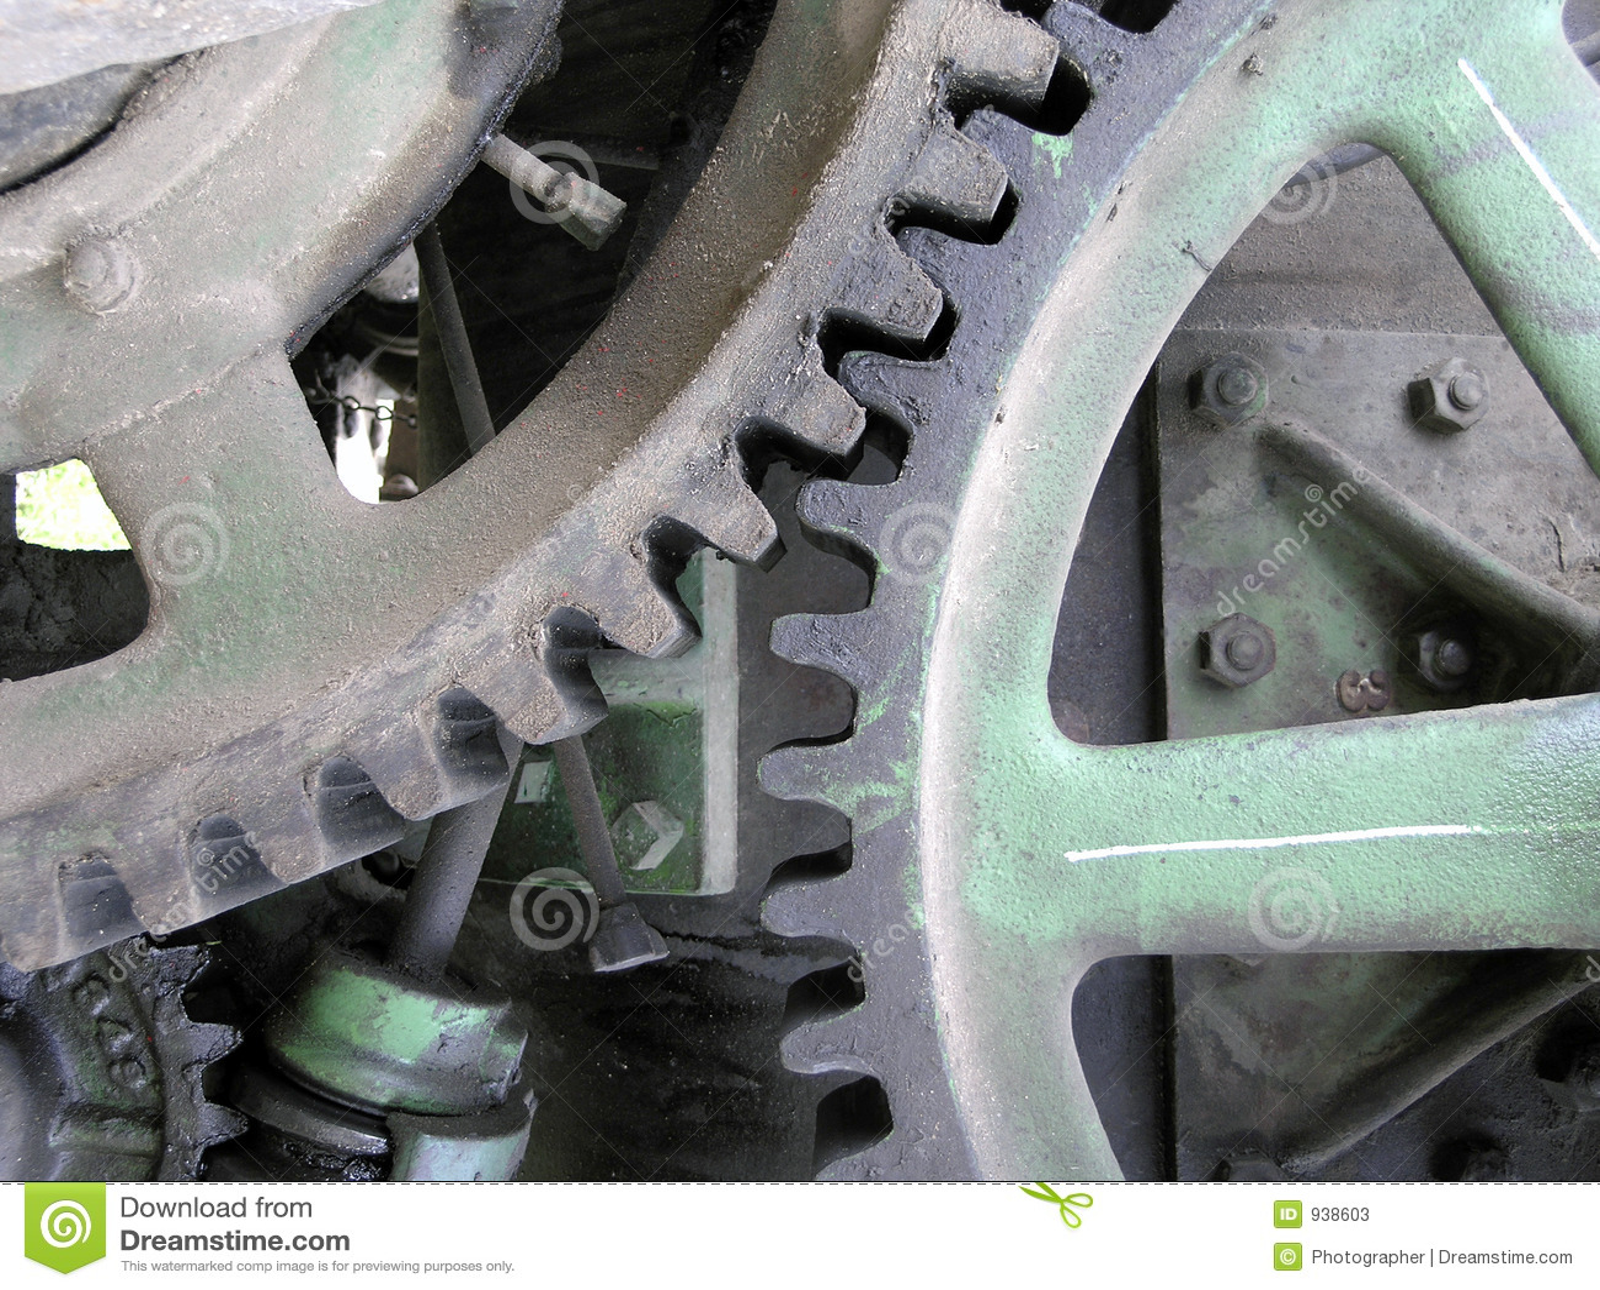 Gear Teeth Meshing Stock Photos - Image: 938603